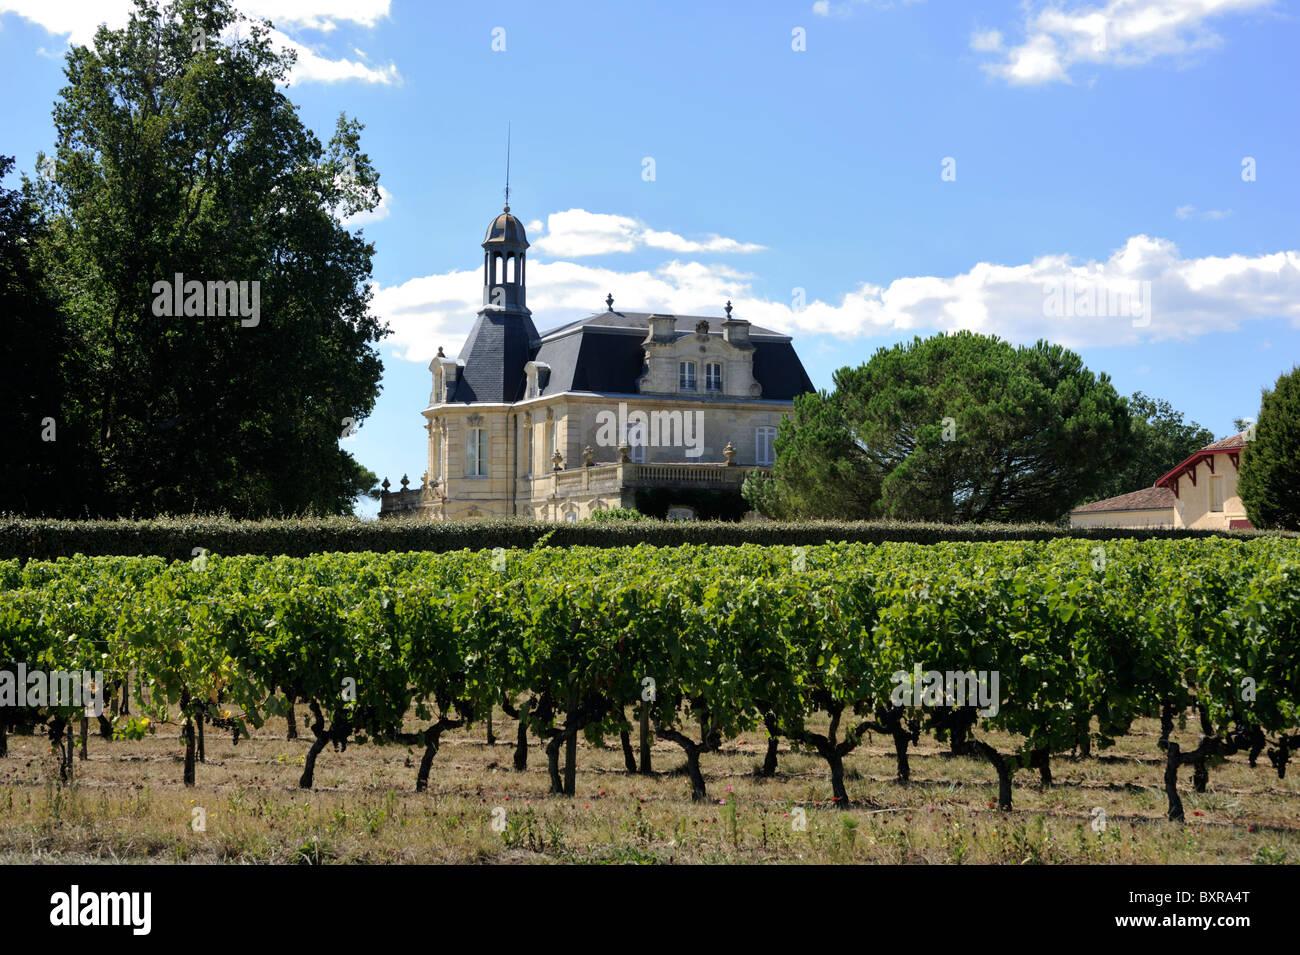 france, bordeaux, medoc vineyards, chateau fonreaud - Stock Image